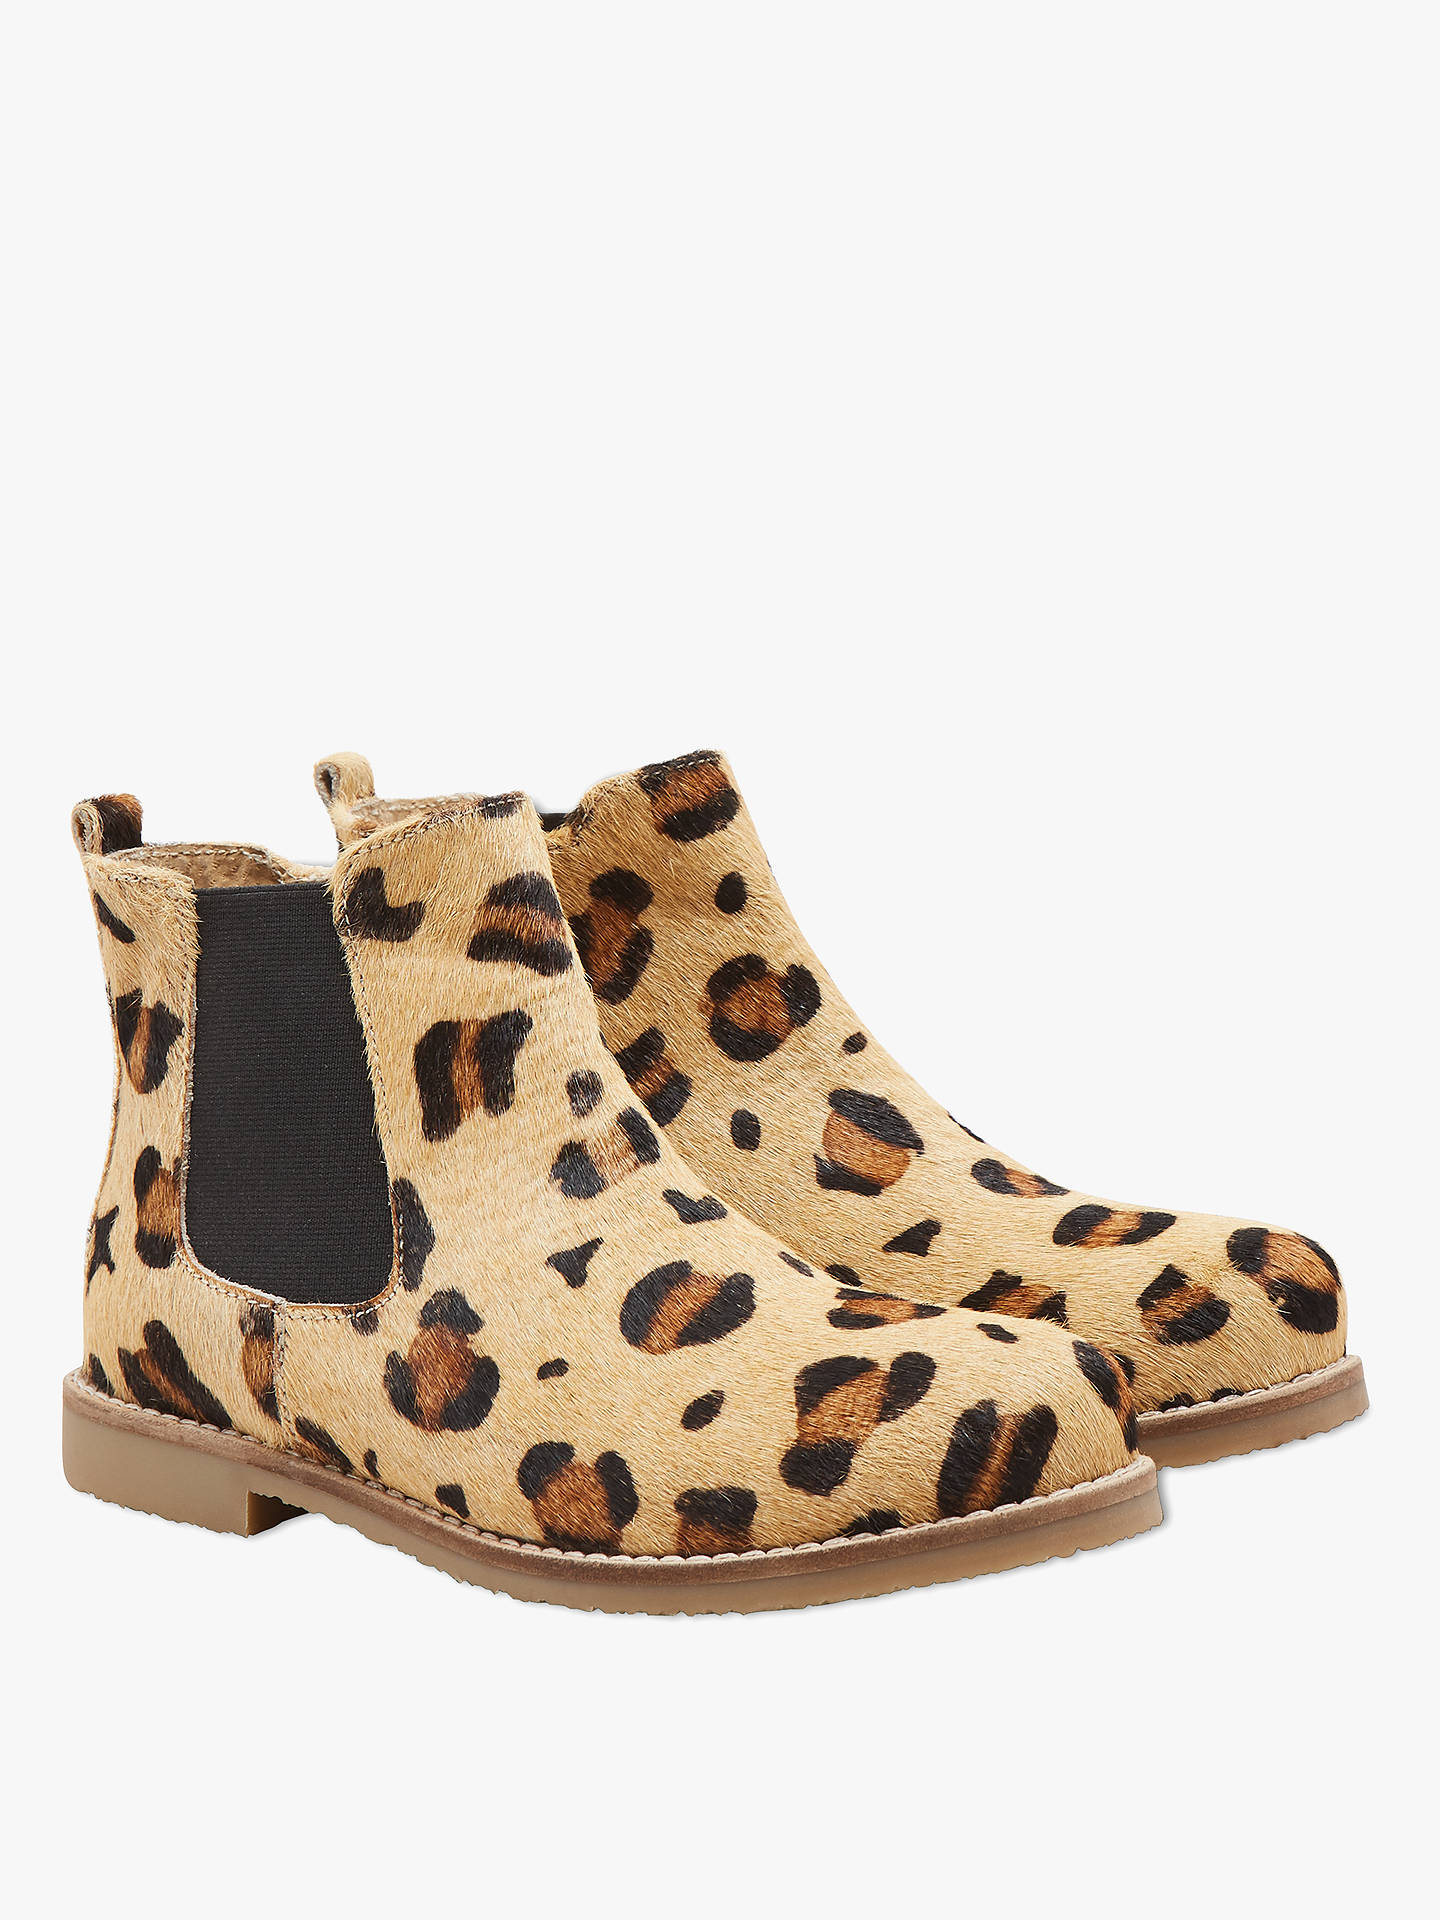 e746ac01ba76 Buy John Lewis & Partners Children's Hannah Leopard Print Chelsea Boots,  Multi, 10 Jnr ...